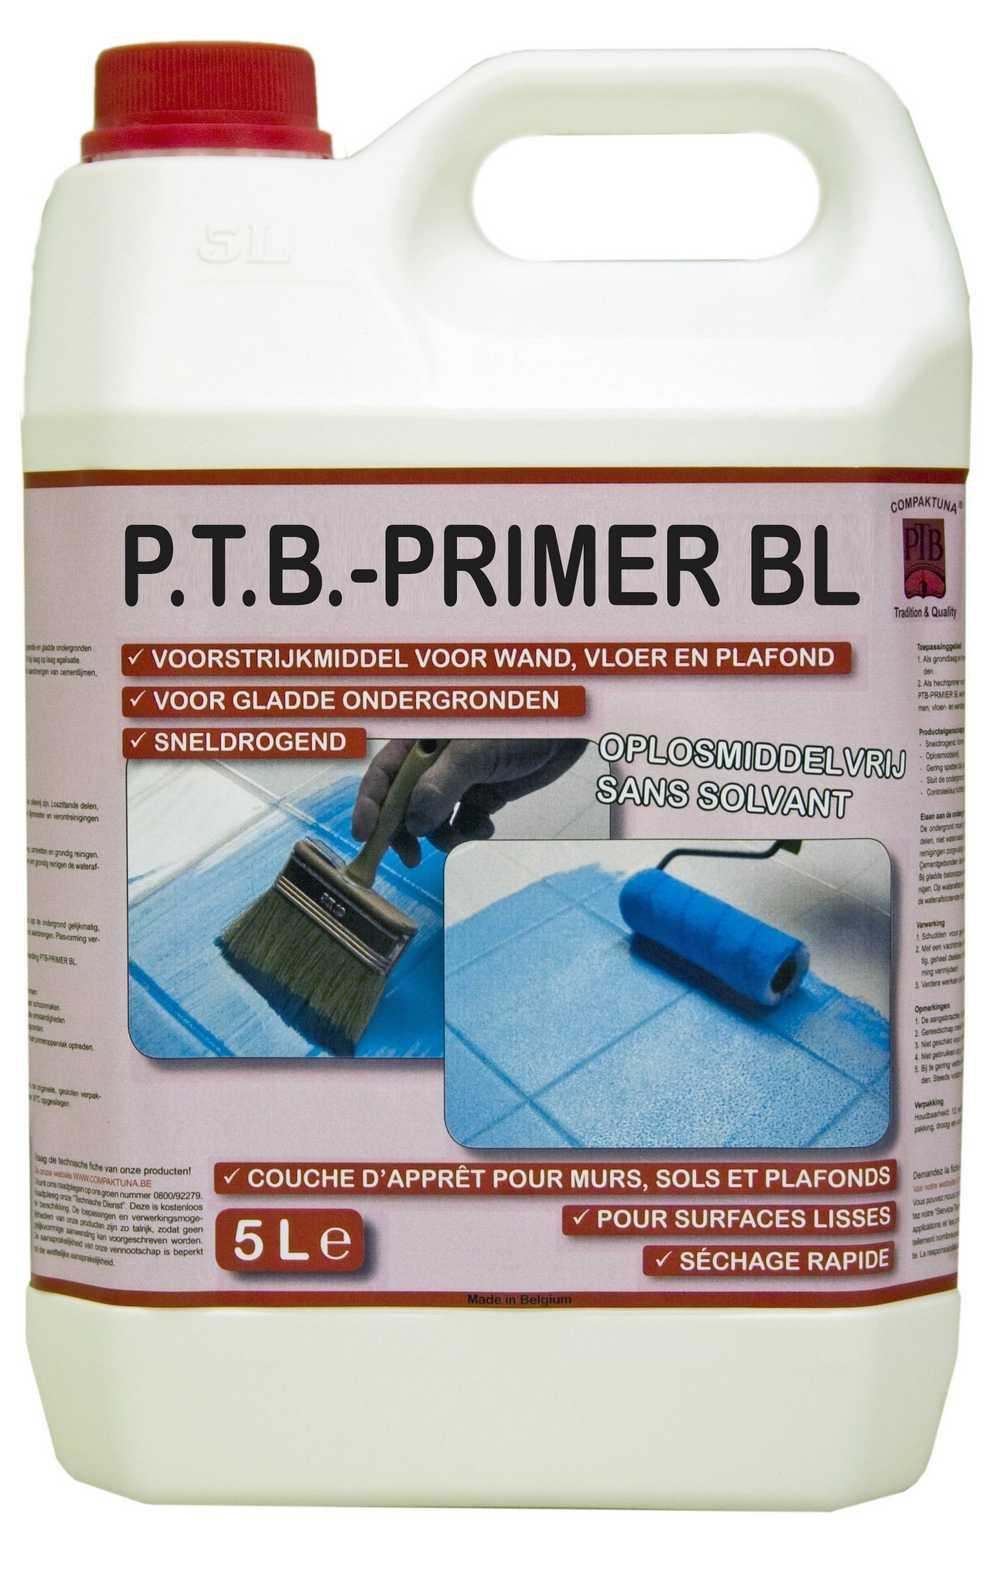 P.t.b.-primer Bl 1liter Lichtblauw